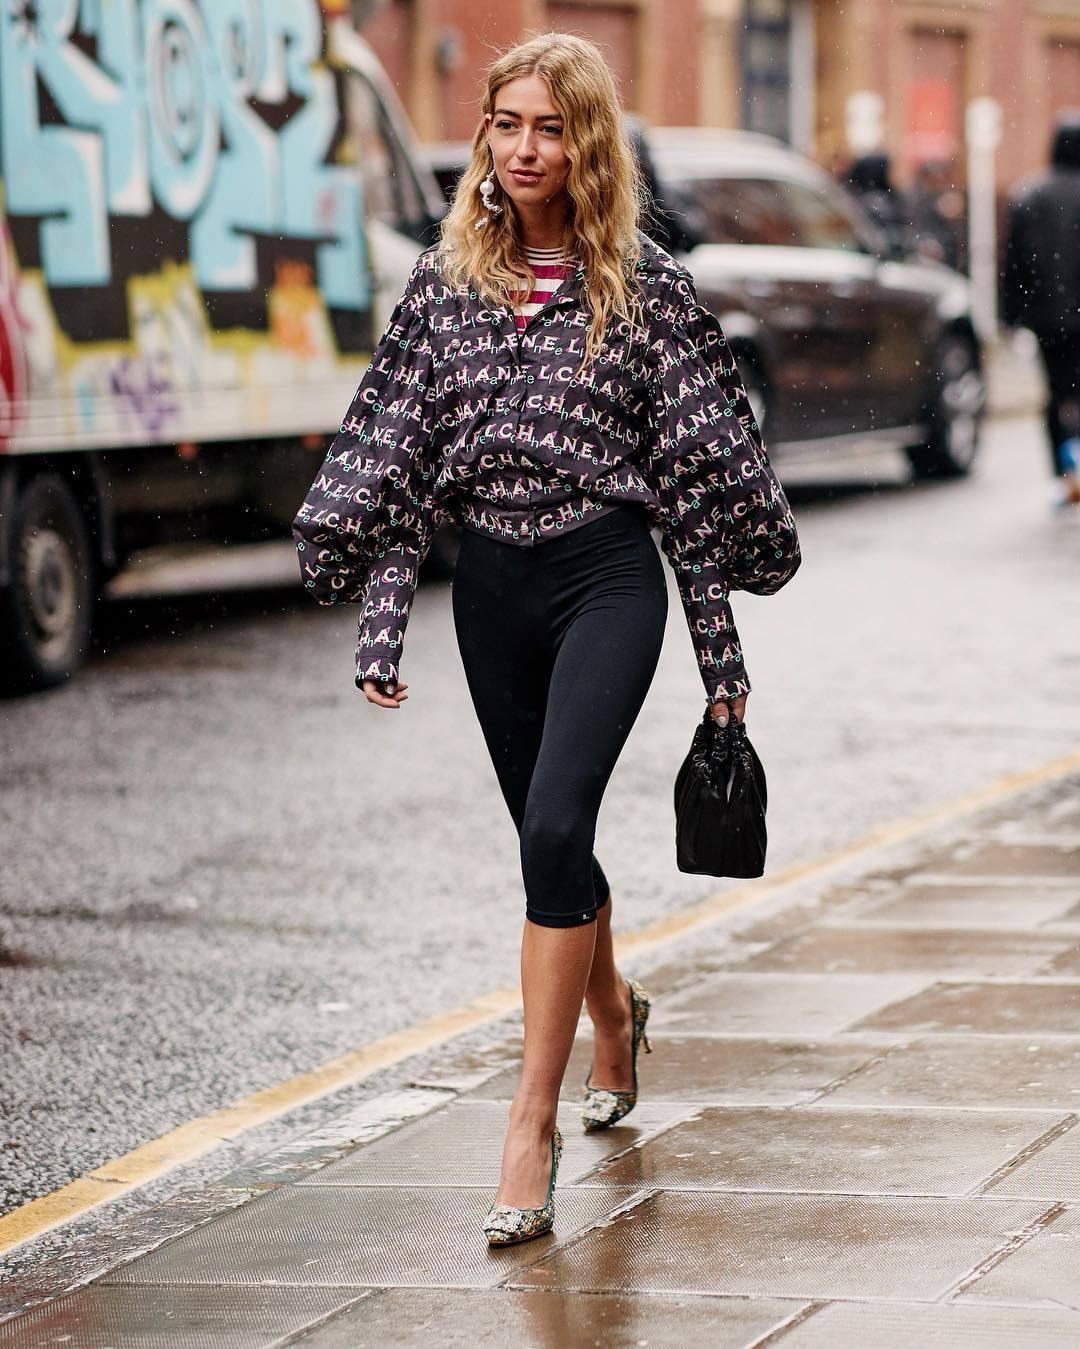 top blouse chanel pumps black shorts black bag striped top